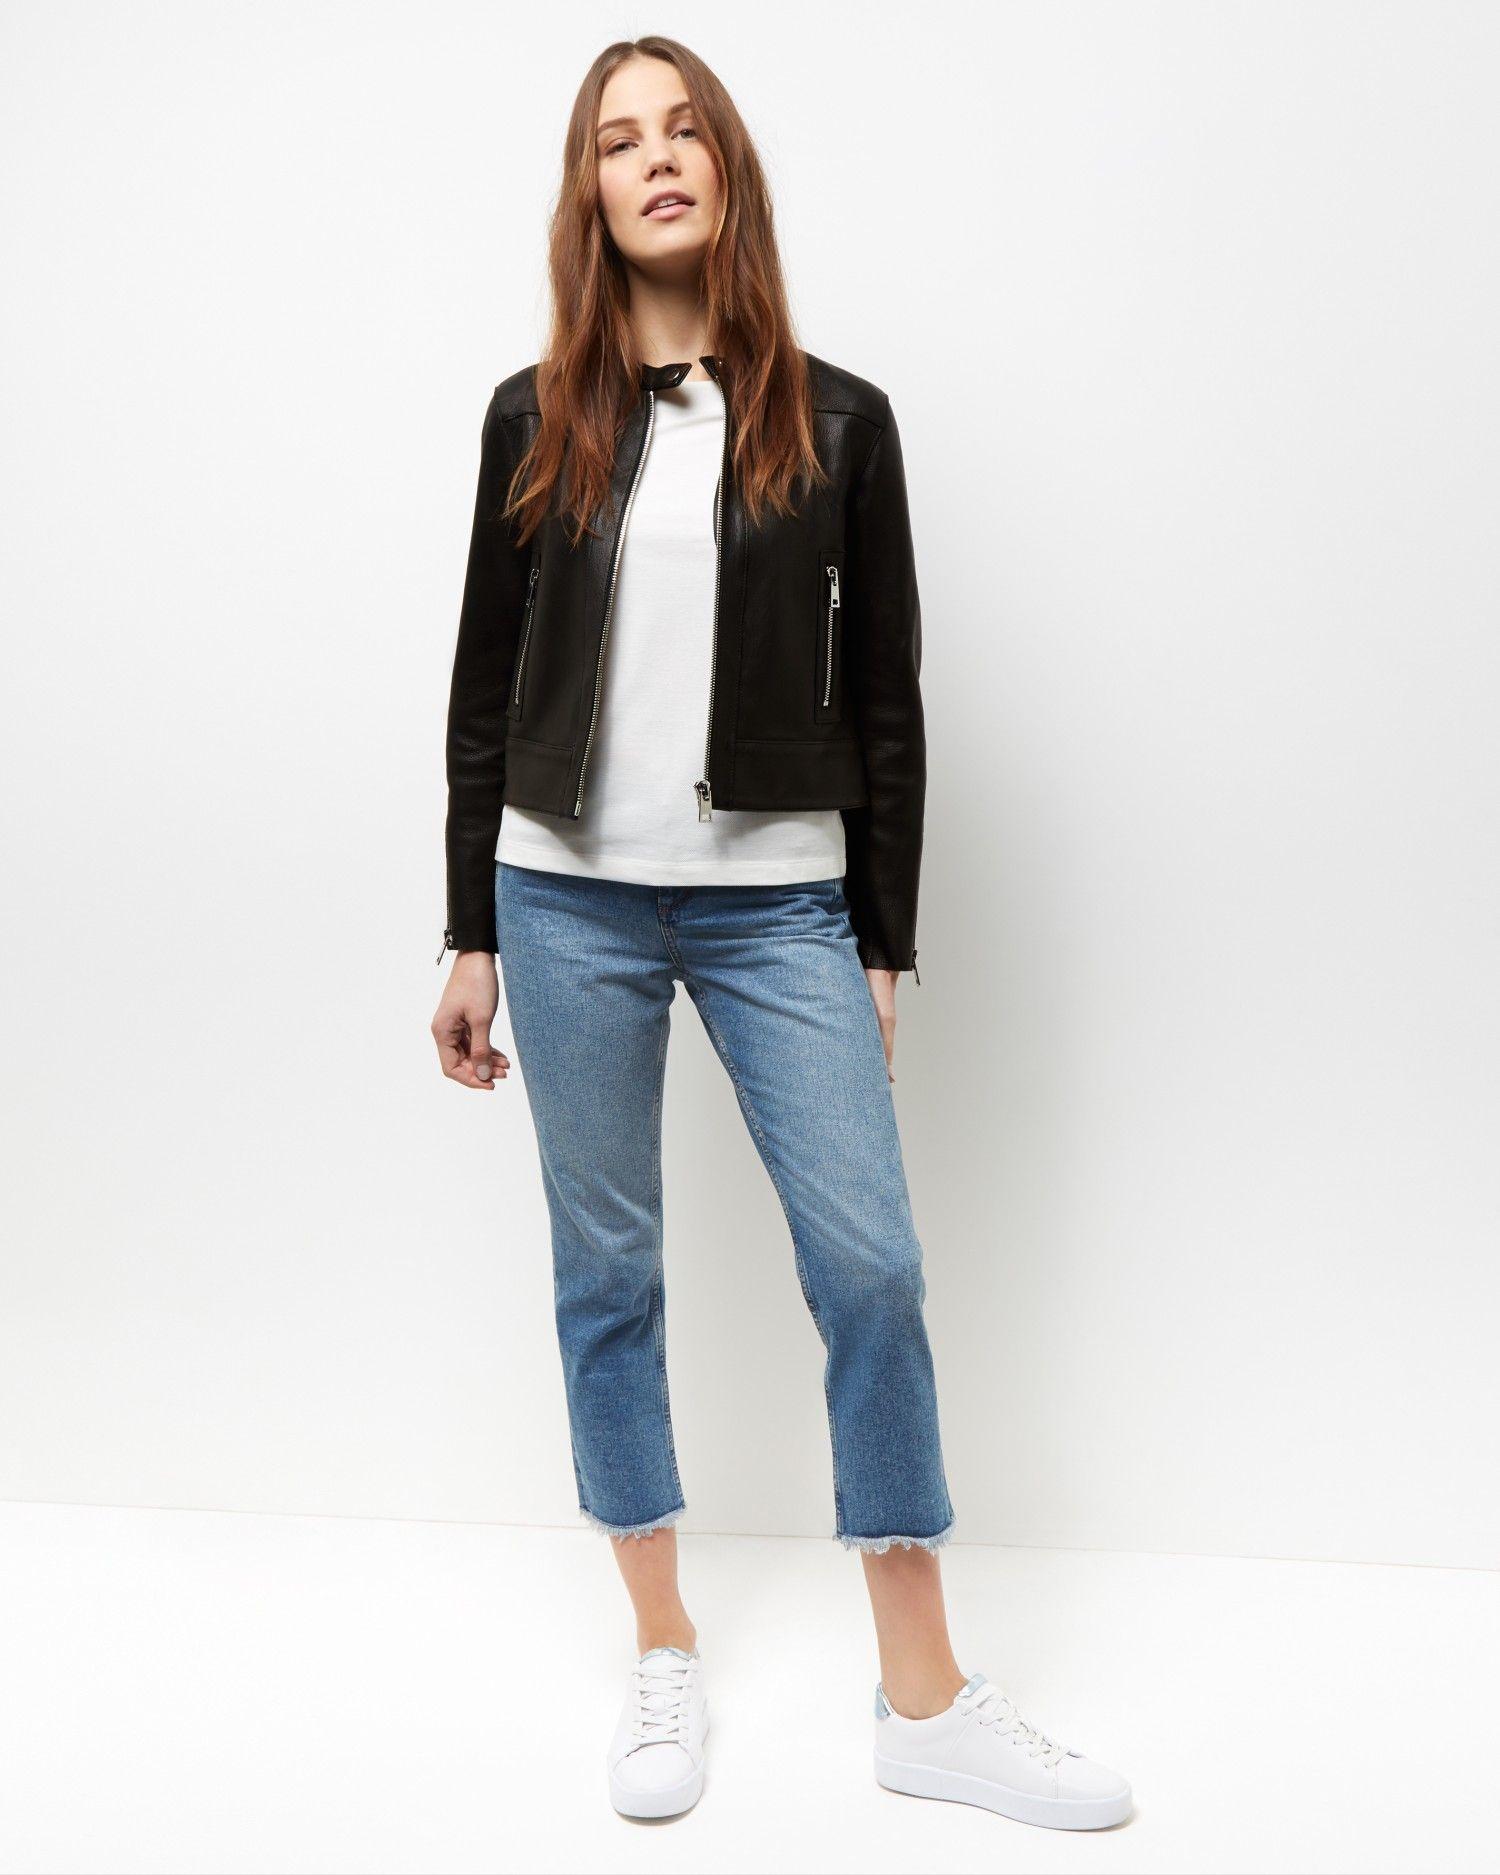 Pin by Savannah Varty on style. Biker jacket, Jackets